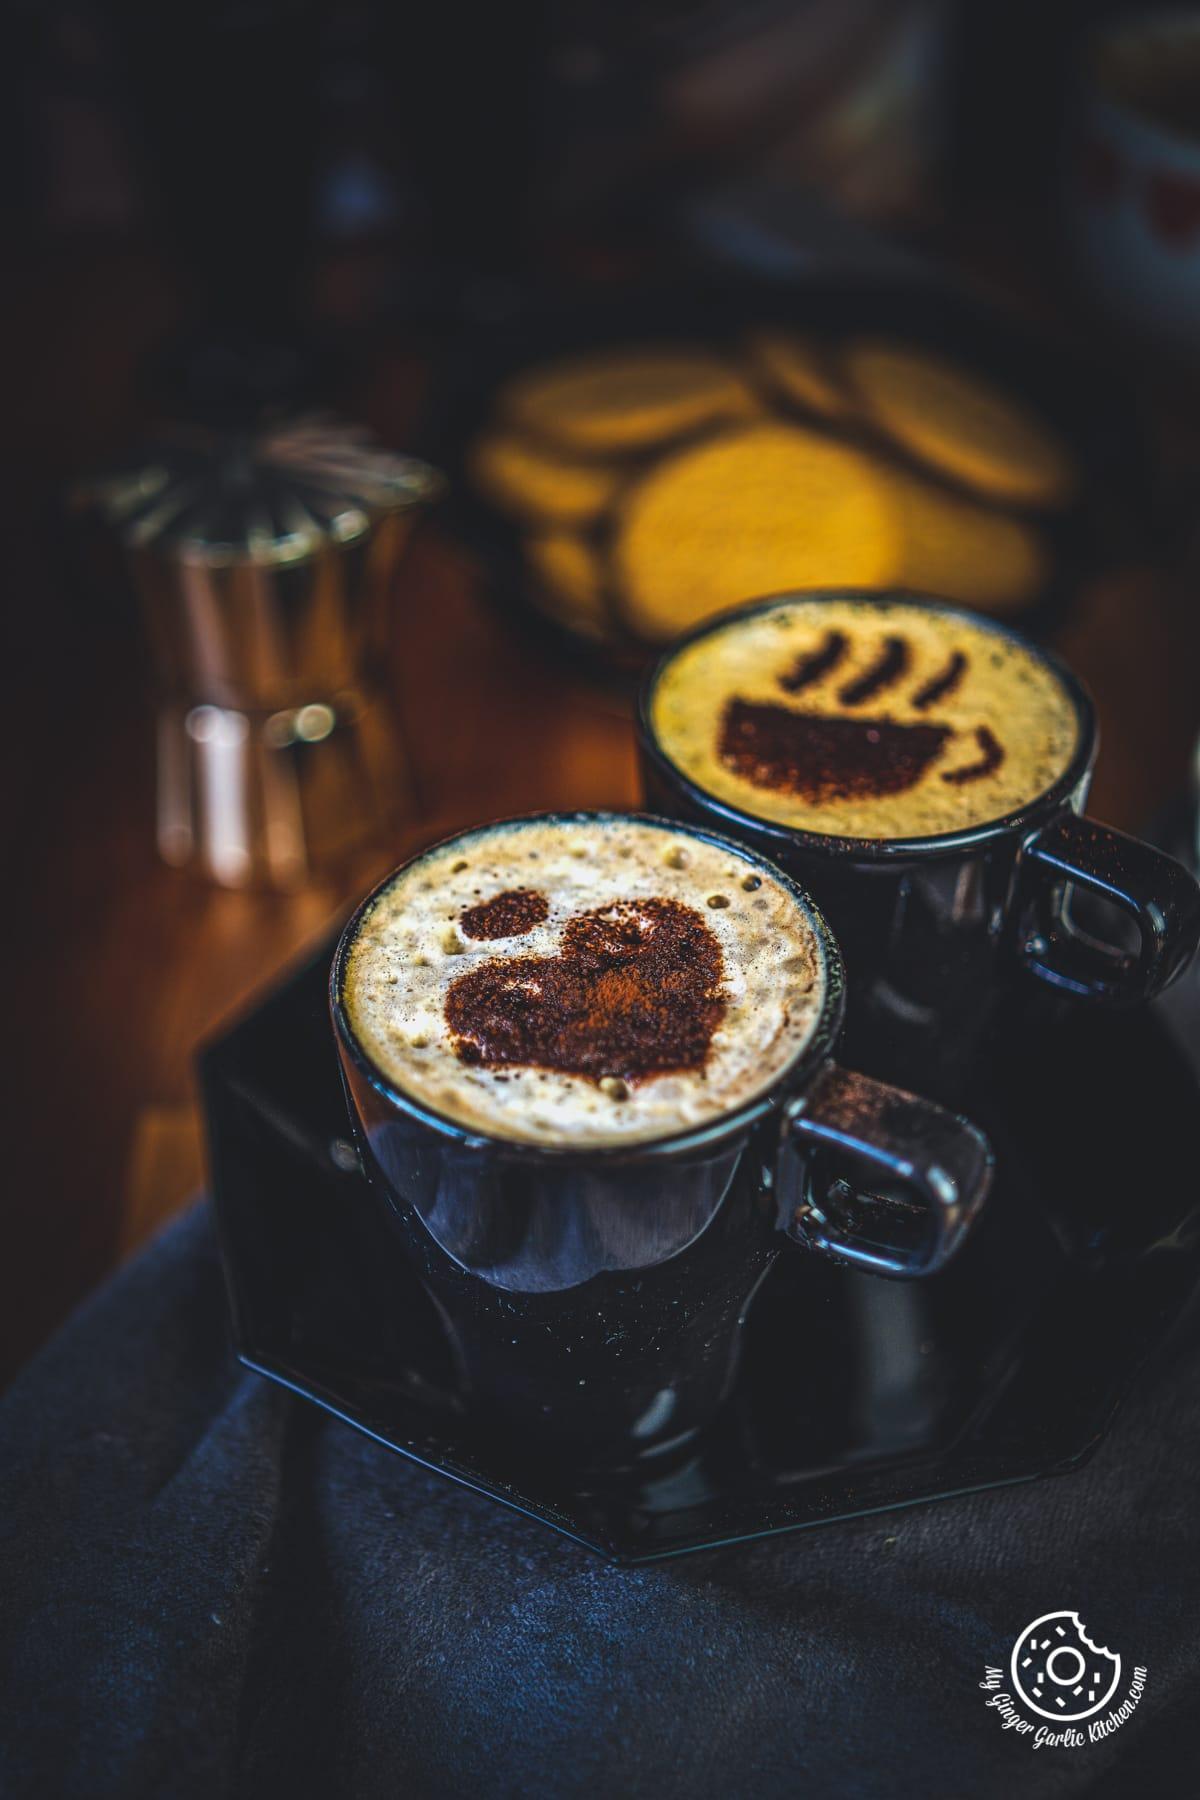 beaten coffee served in black mugs